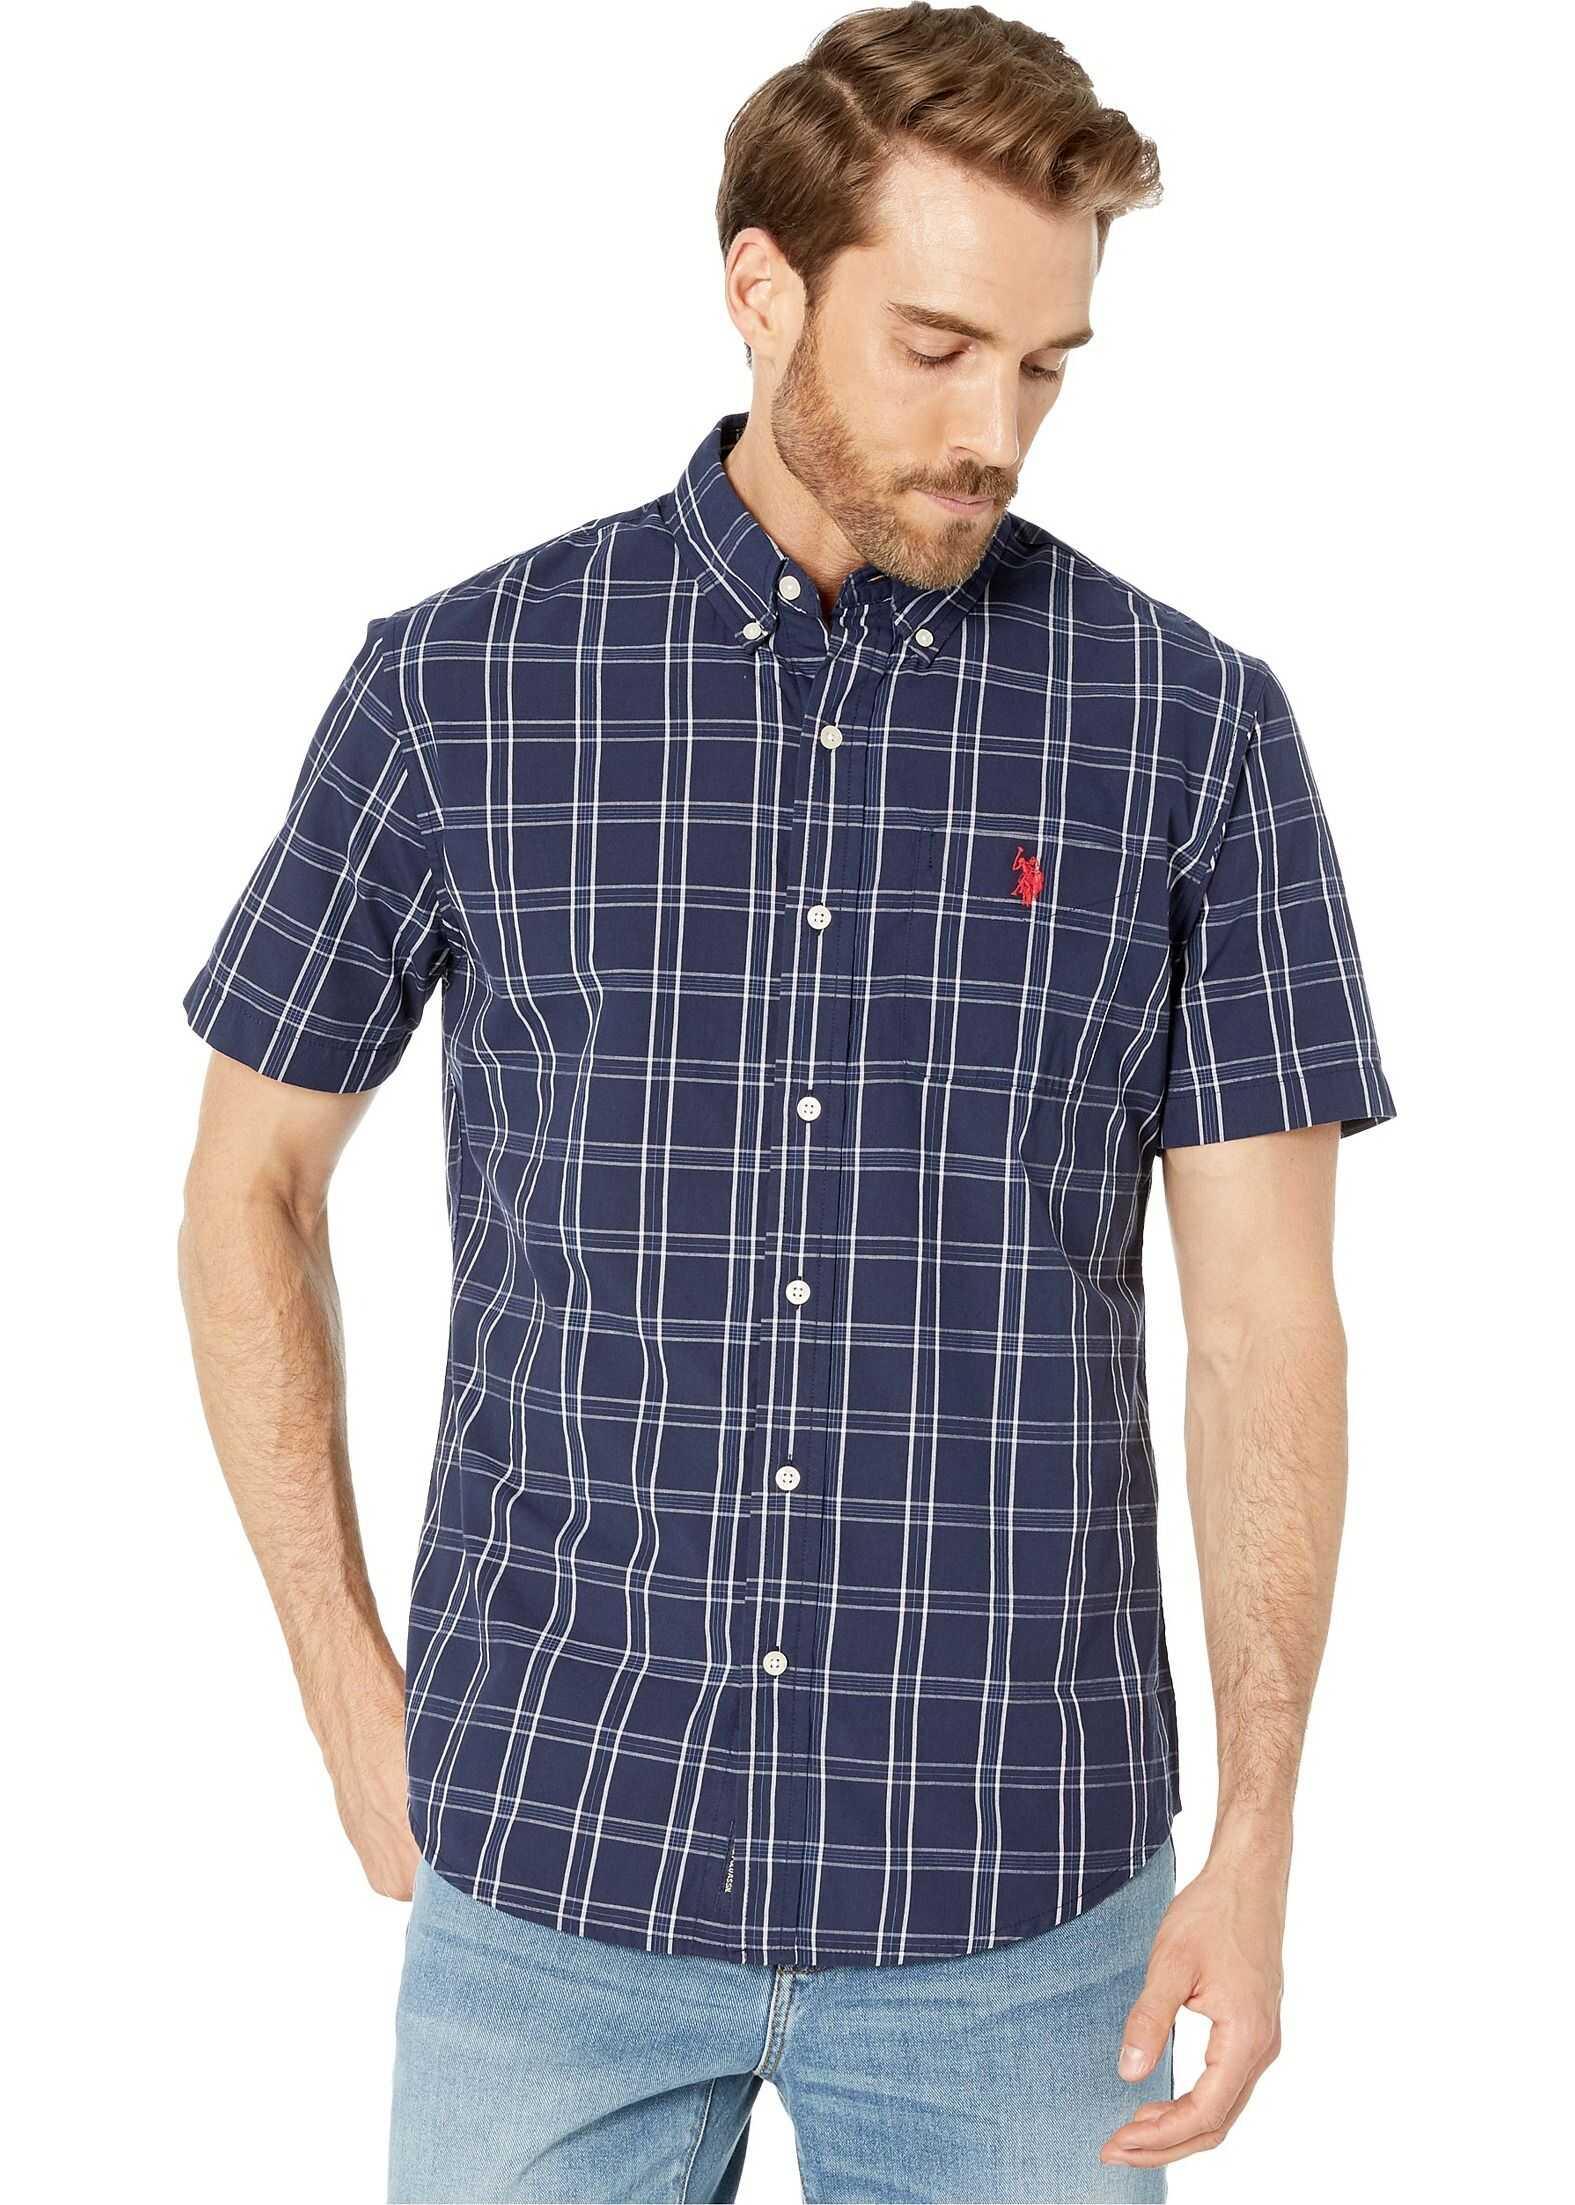 U.S. POLO ASSN. Plaid Poplin Shirt Classic Navy